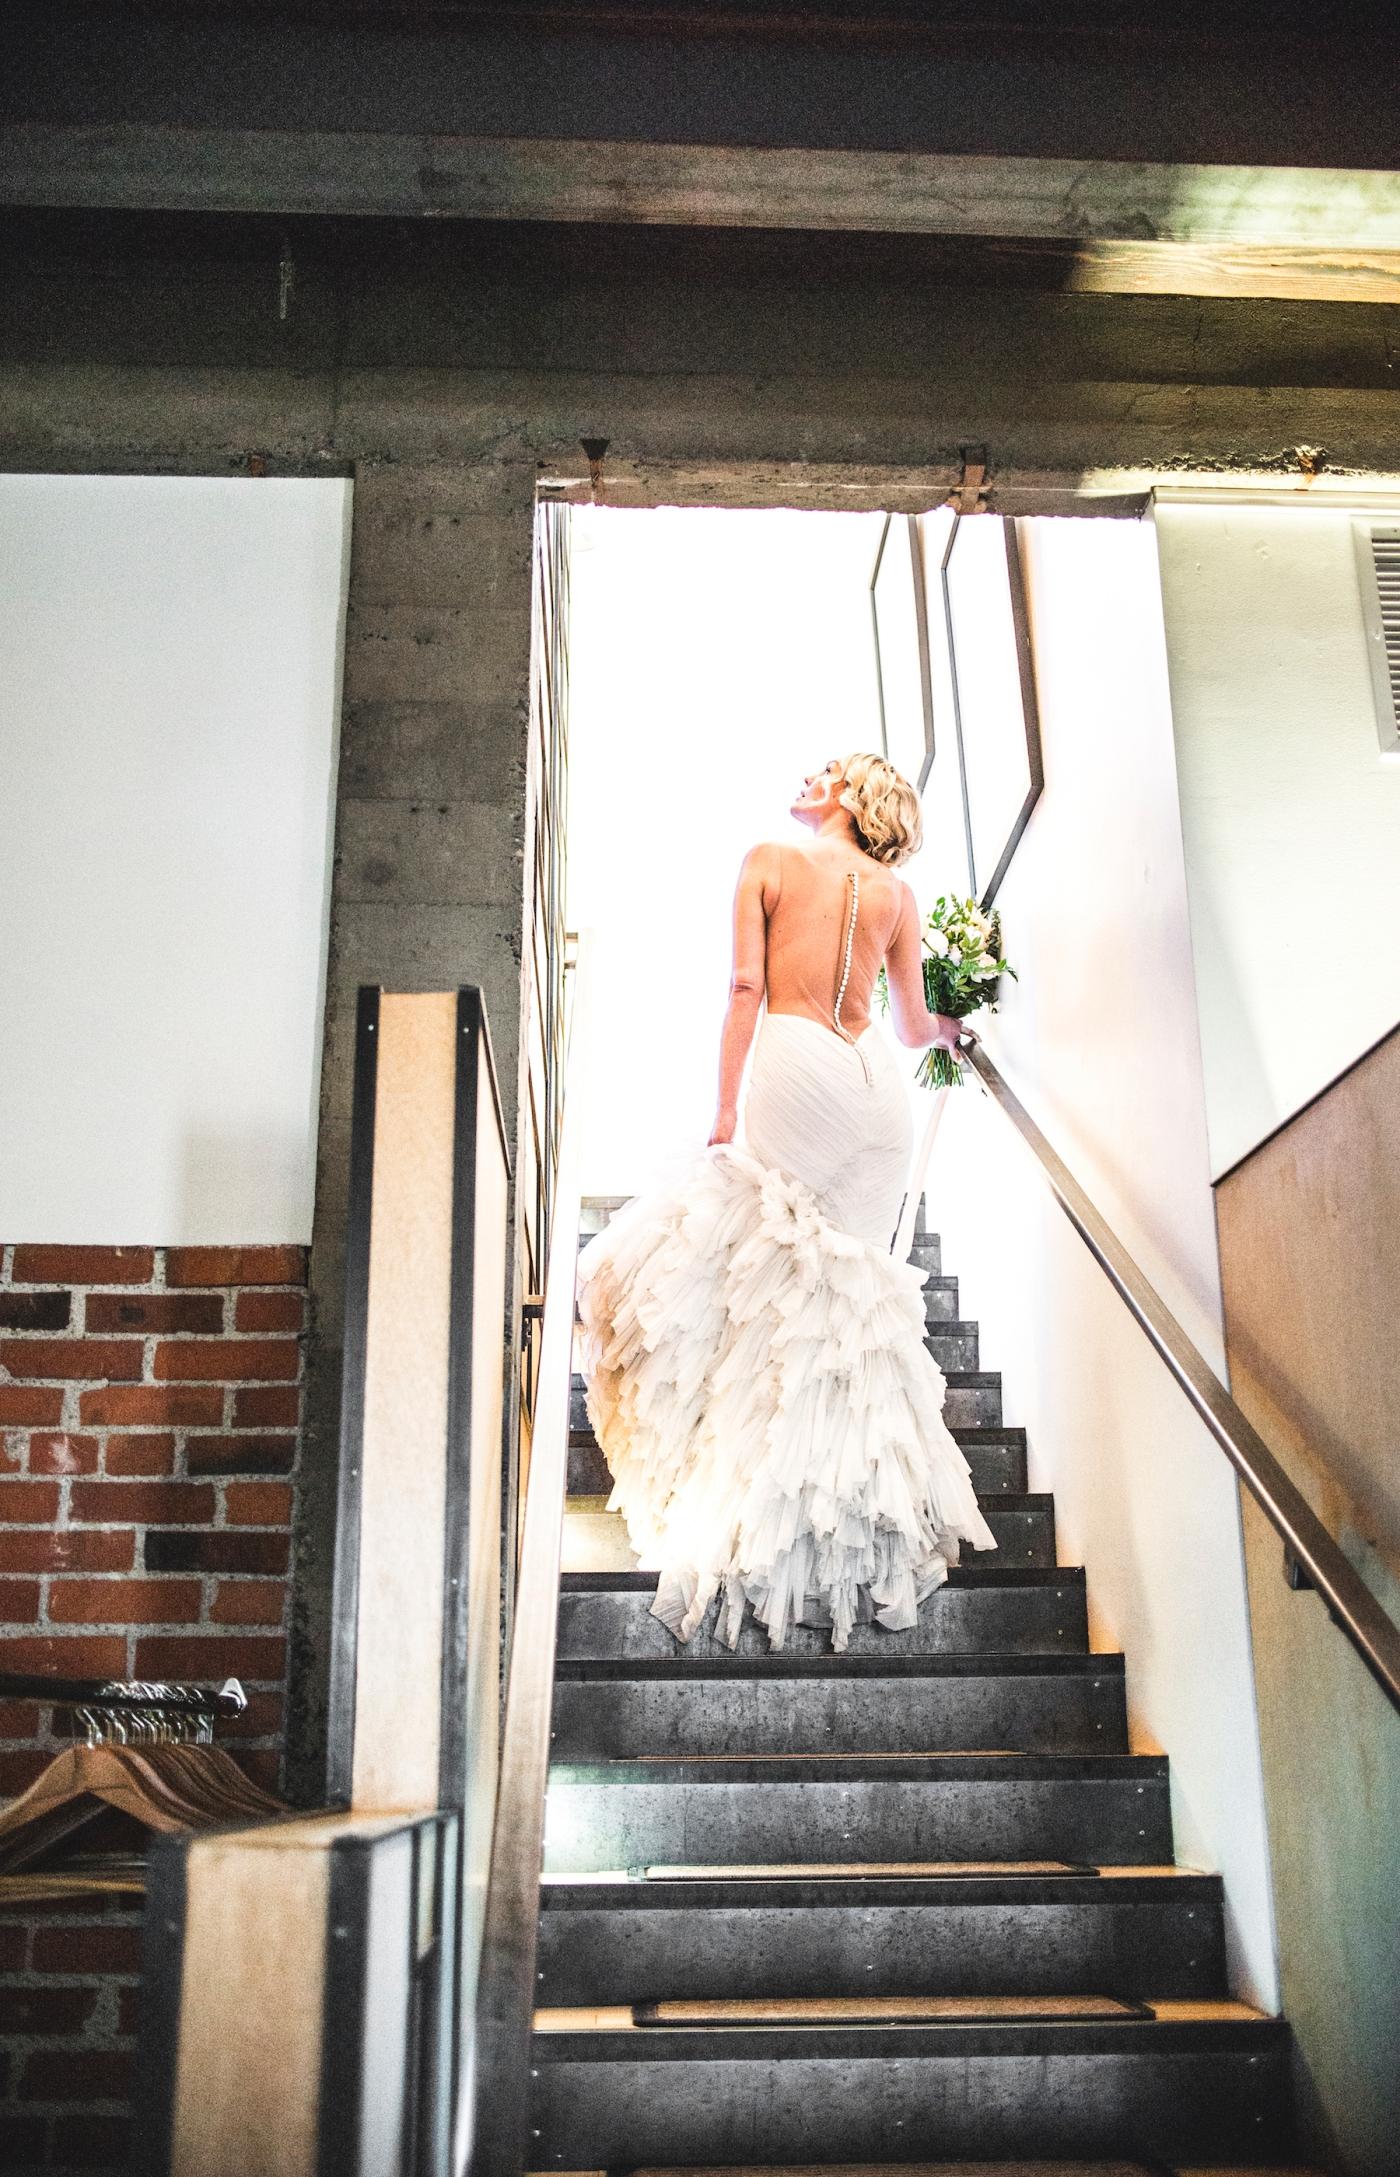 photography_by_jane_speleers_2017_wedding_show_i_do_sodo_within_designed_by_melody_davisdsc_0446